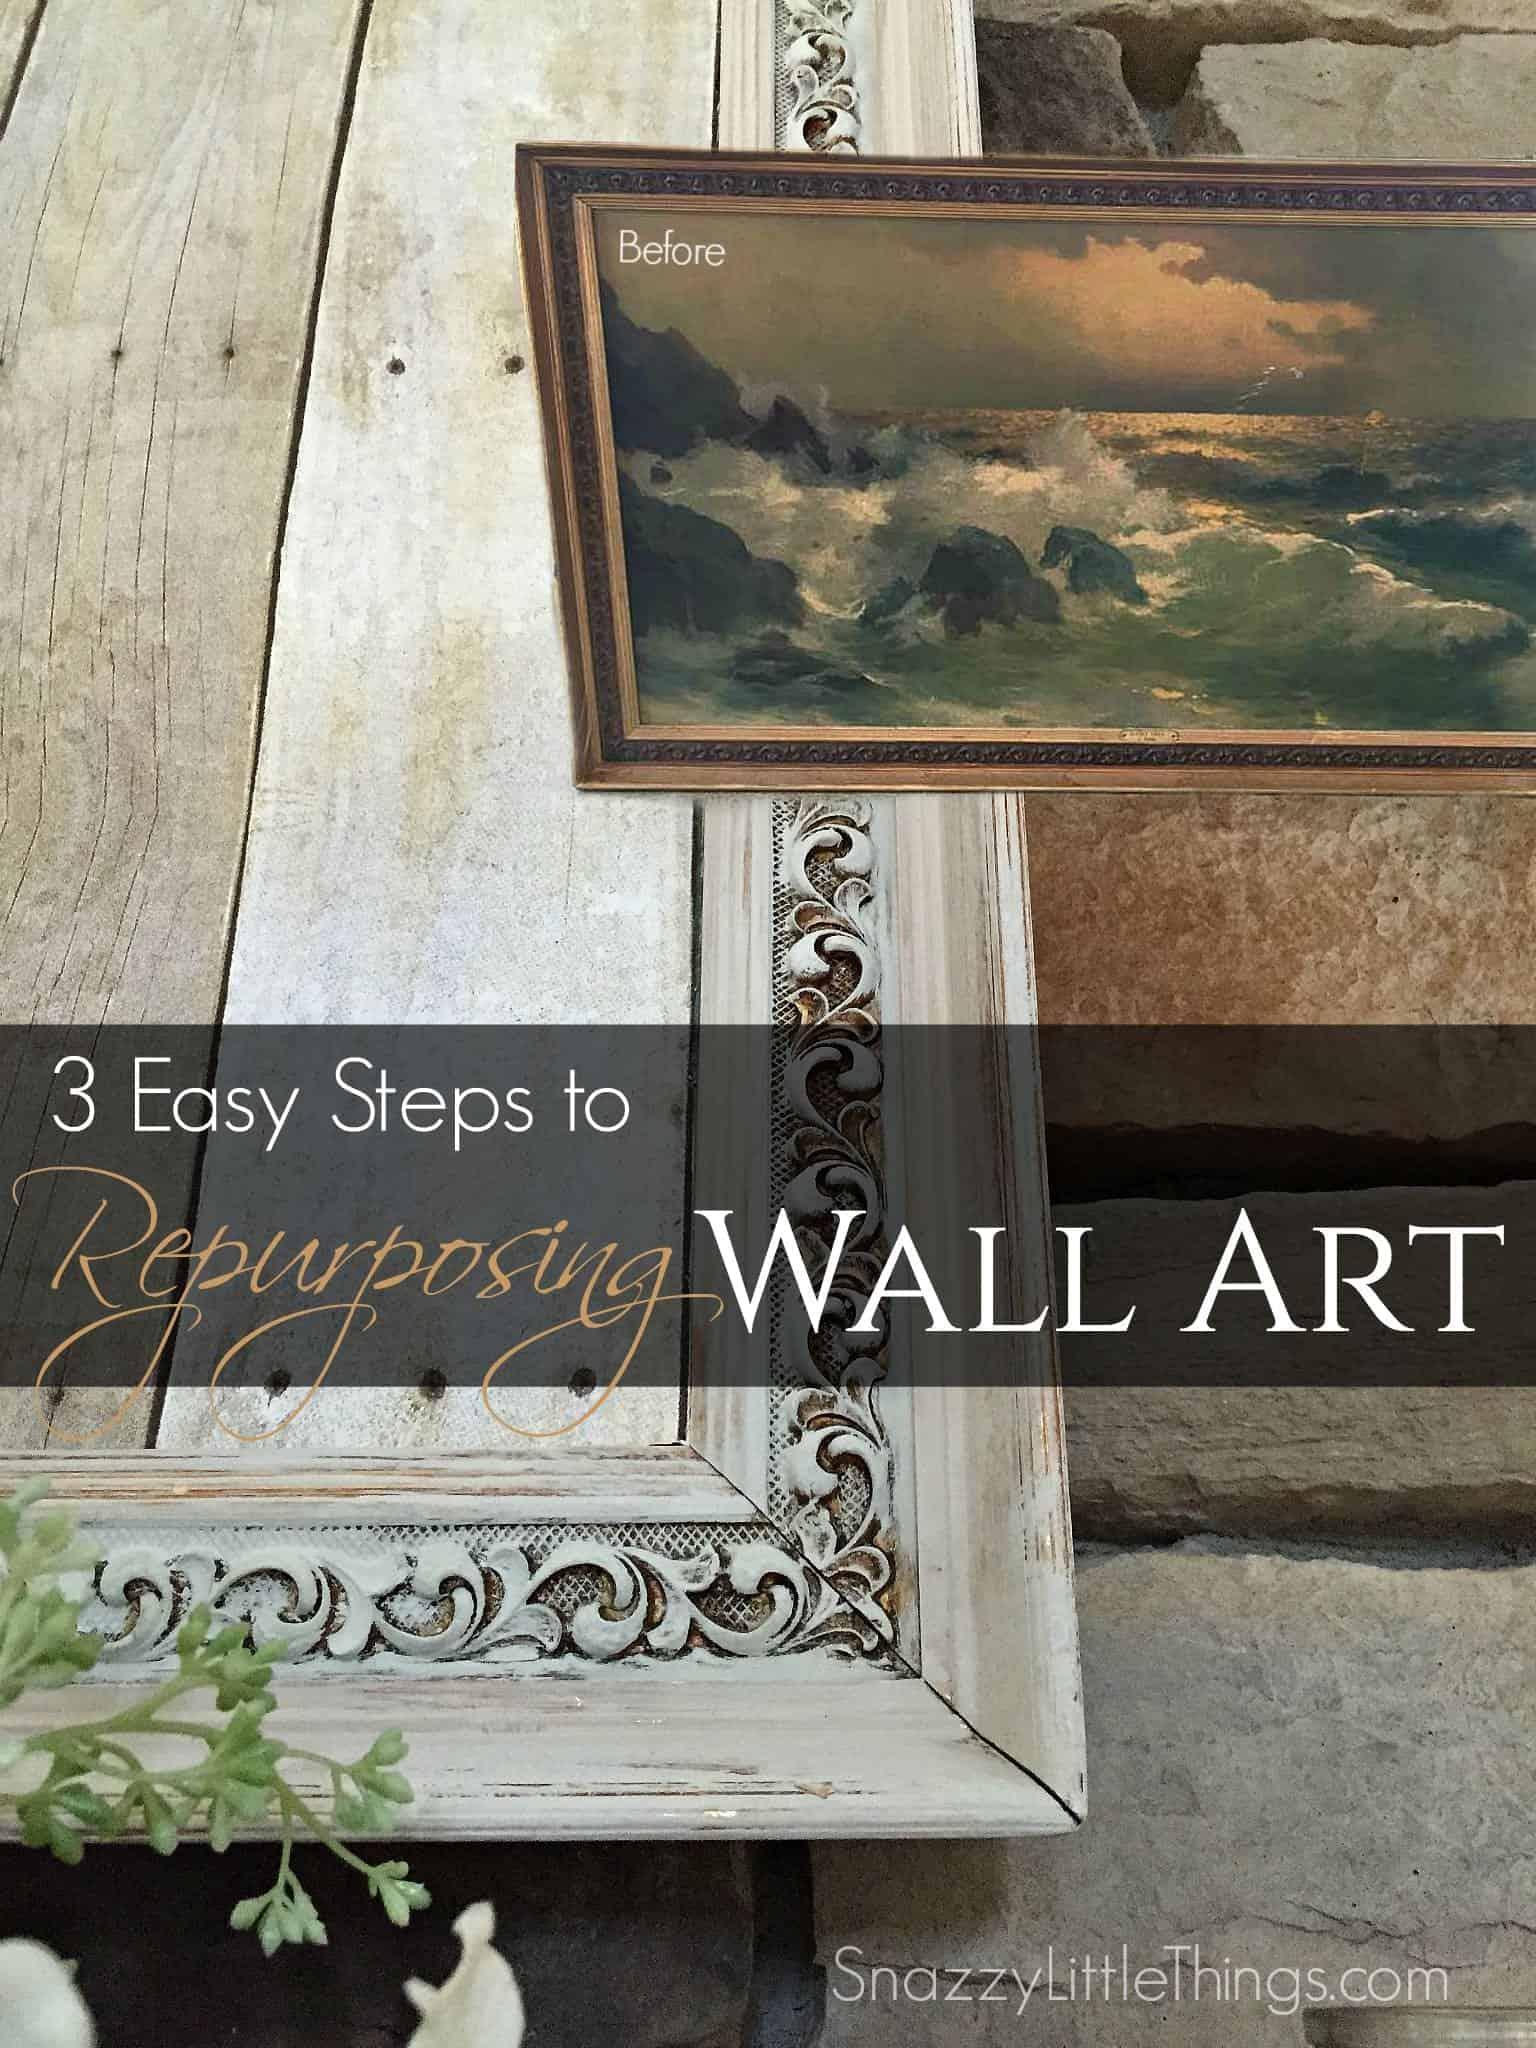 Repurposing Making Old Art Beautiful Again Snazzy Little Things